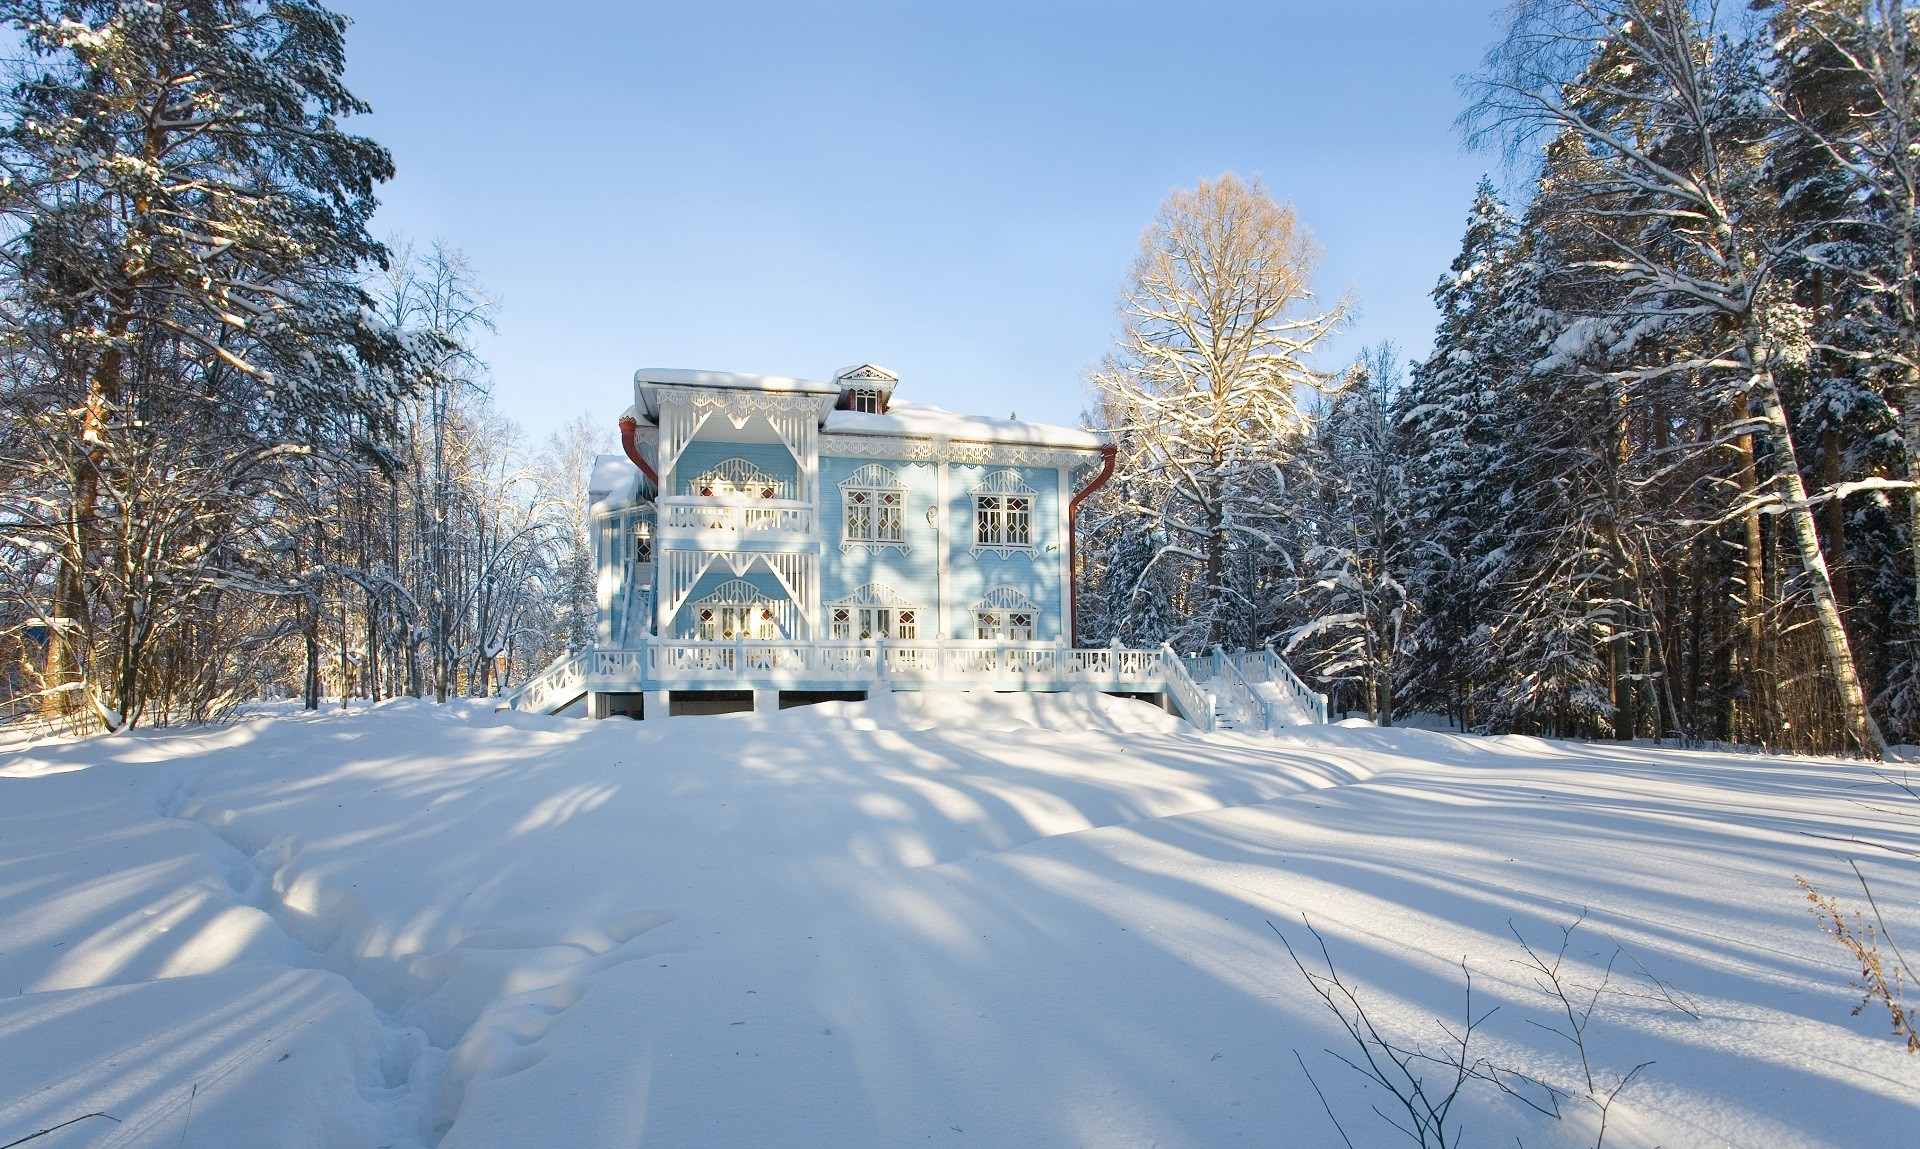 Residência de Snegúrotchka em Schelikovo